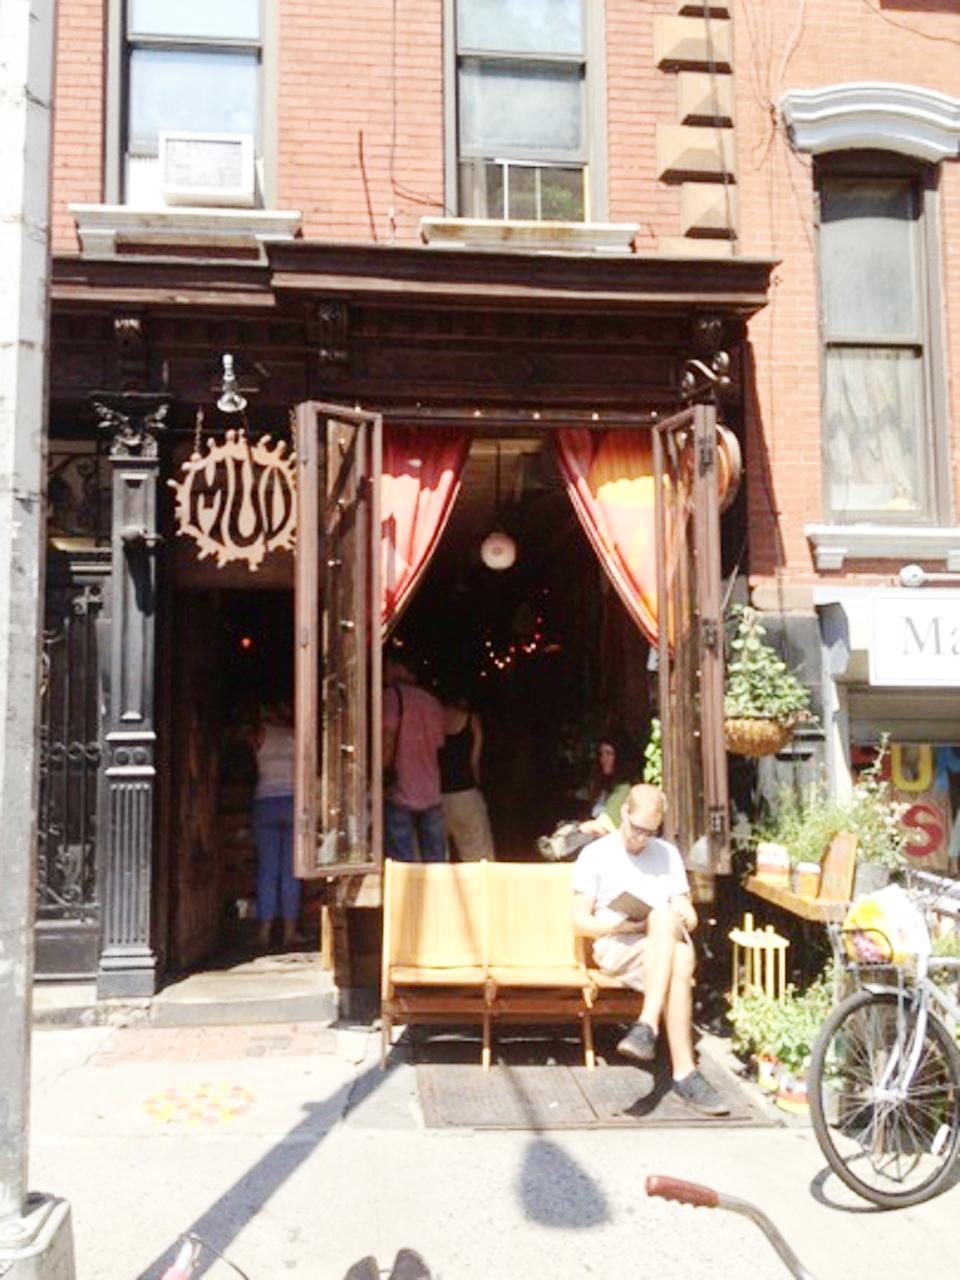 Mud Coffee at 307 East 9th Street, East Village, New York